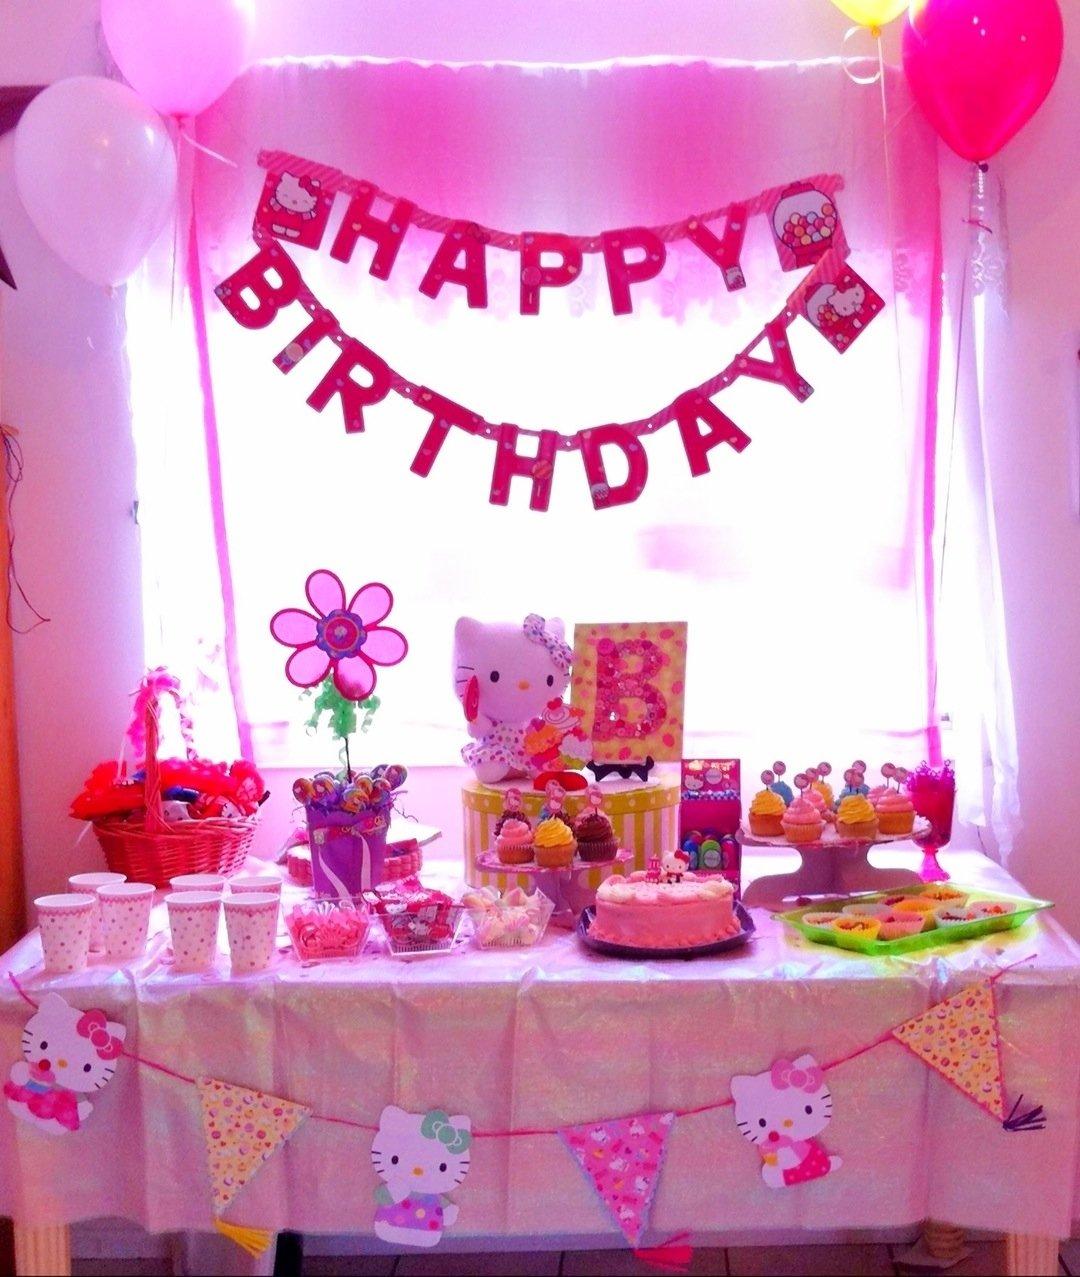 10 Unique Hello Kitty Party Decoration Ideas images about hello kitty party decorations ideas on pinterest 2021